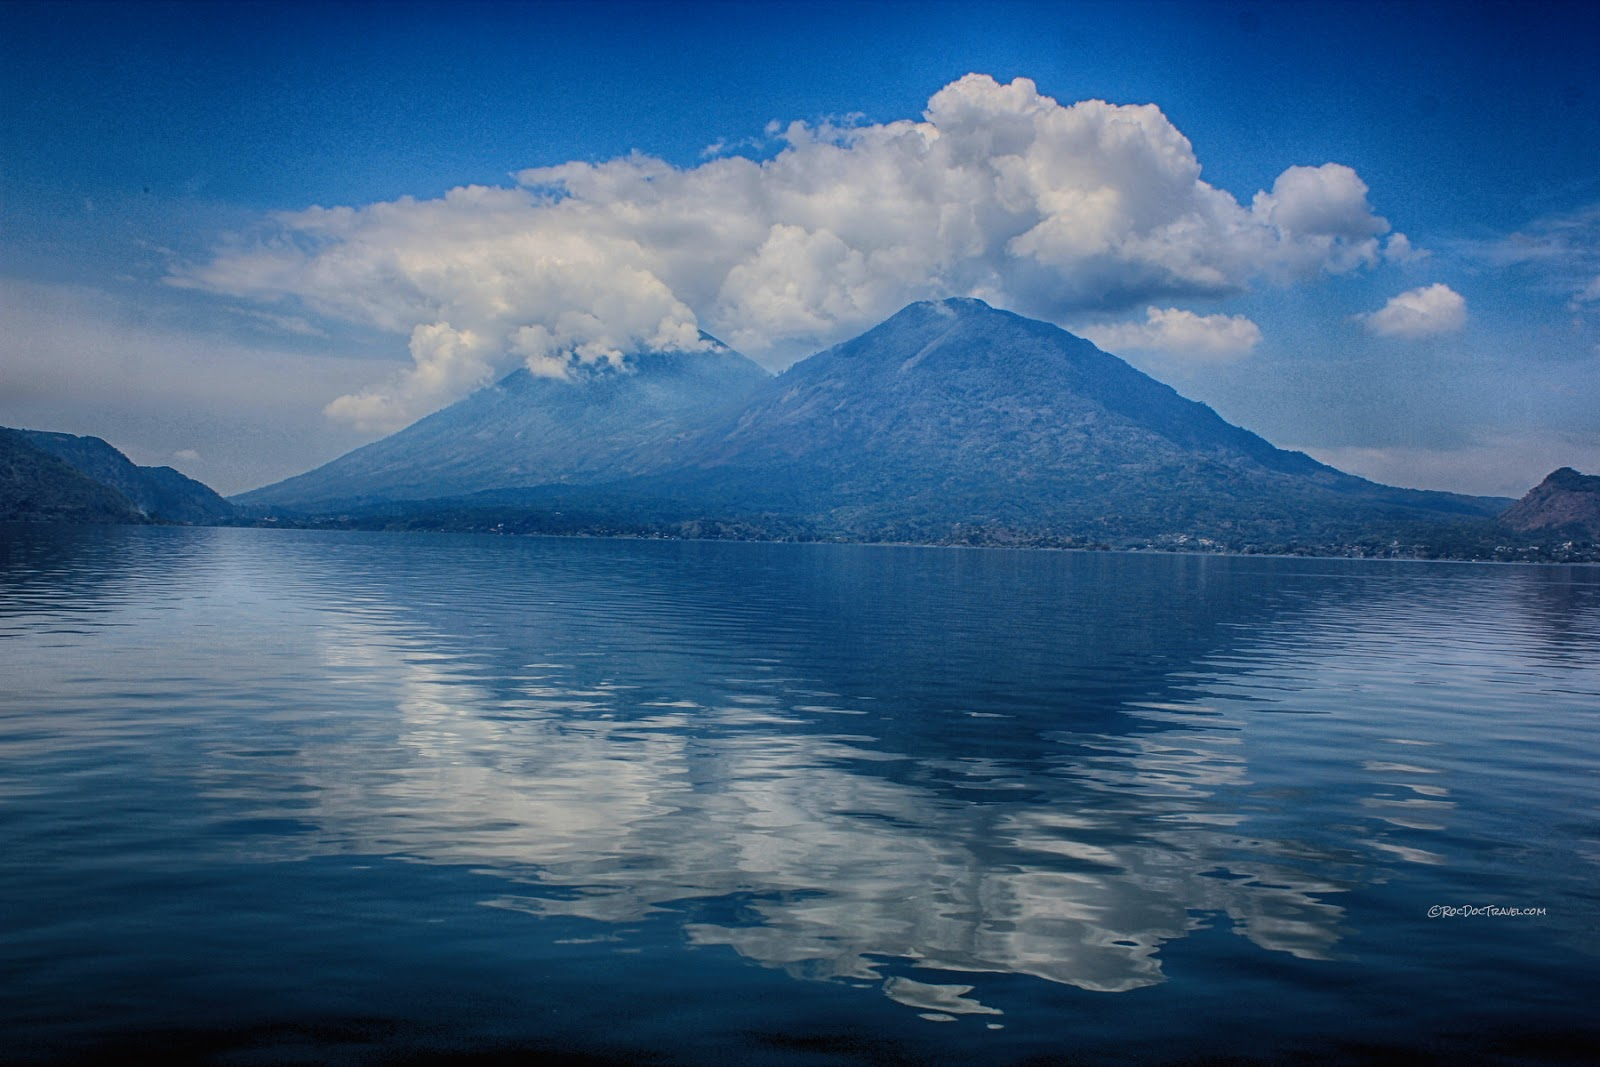 Guatemala volcanoes geology field trip travel Antigua Panajachel Pacaya Fuego Agua Atitlan copyright rocdoctravel.com